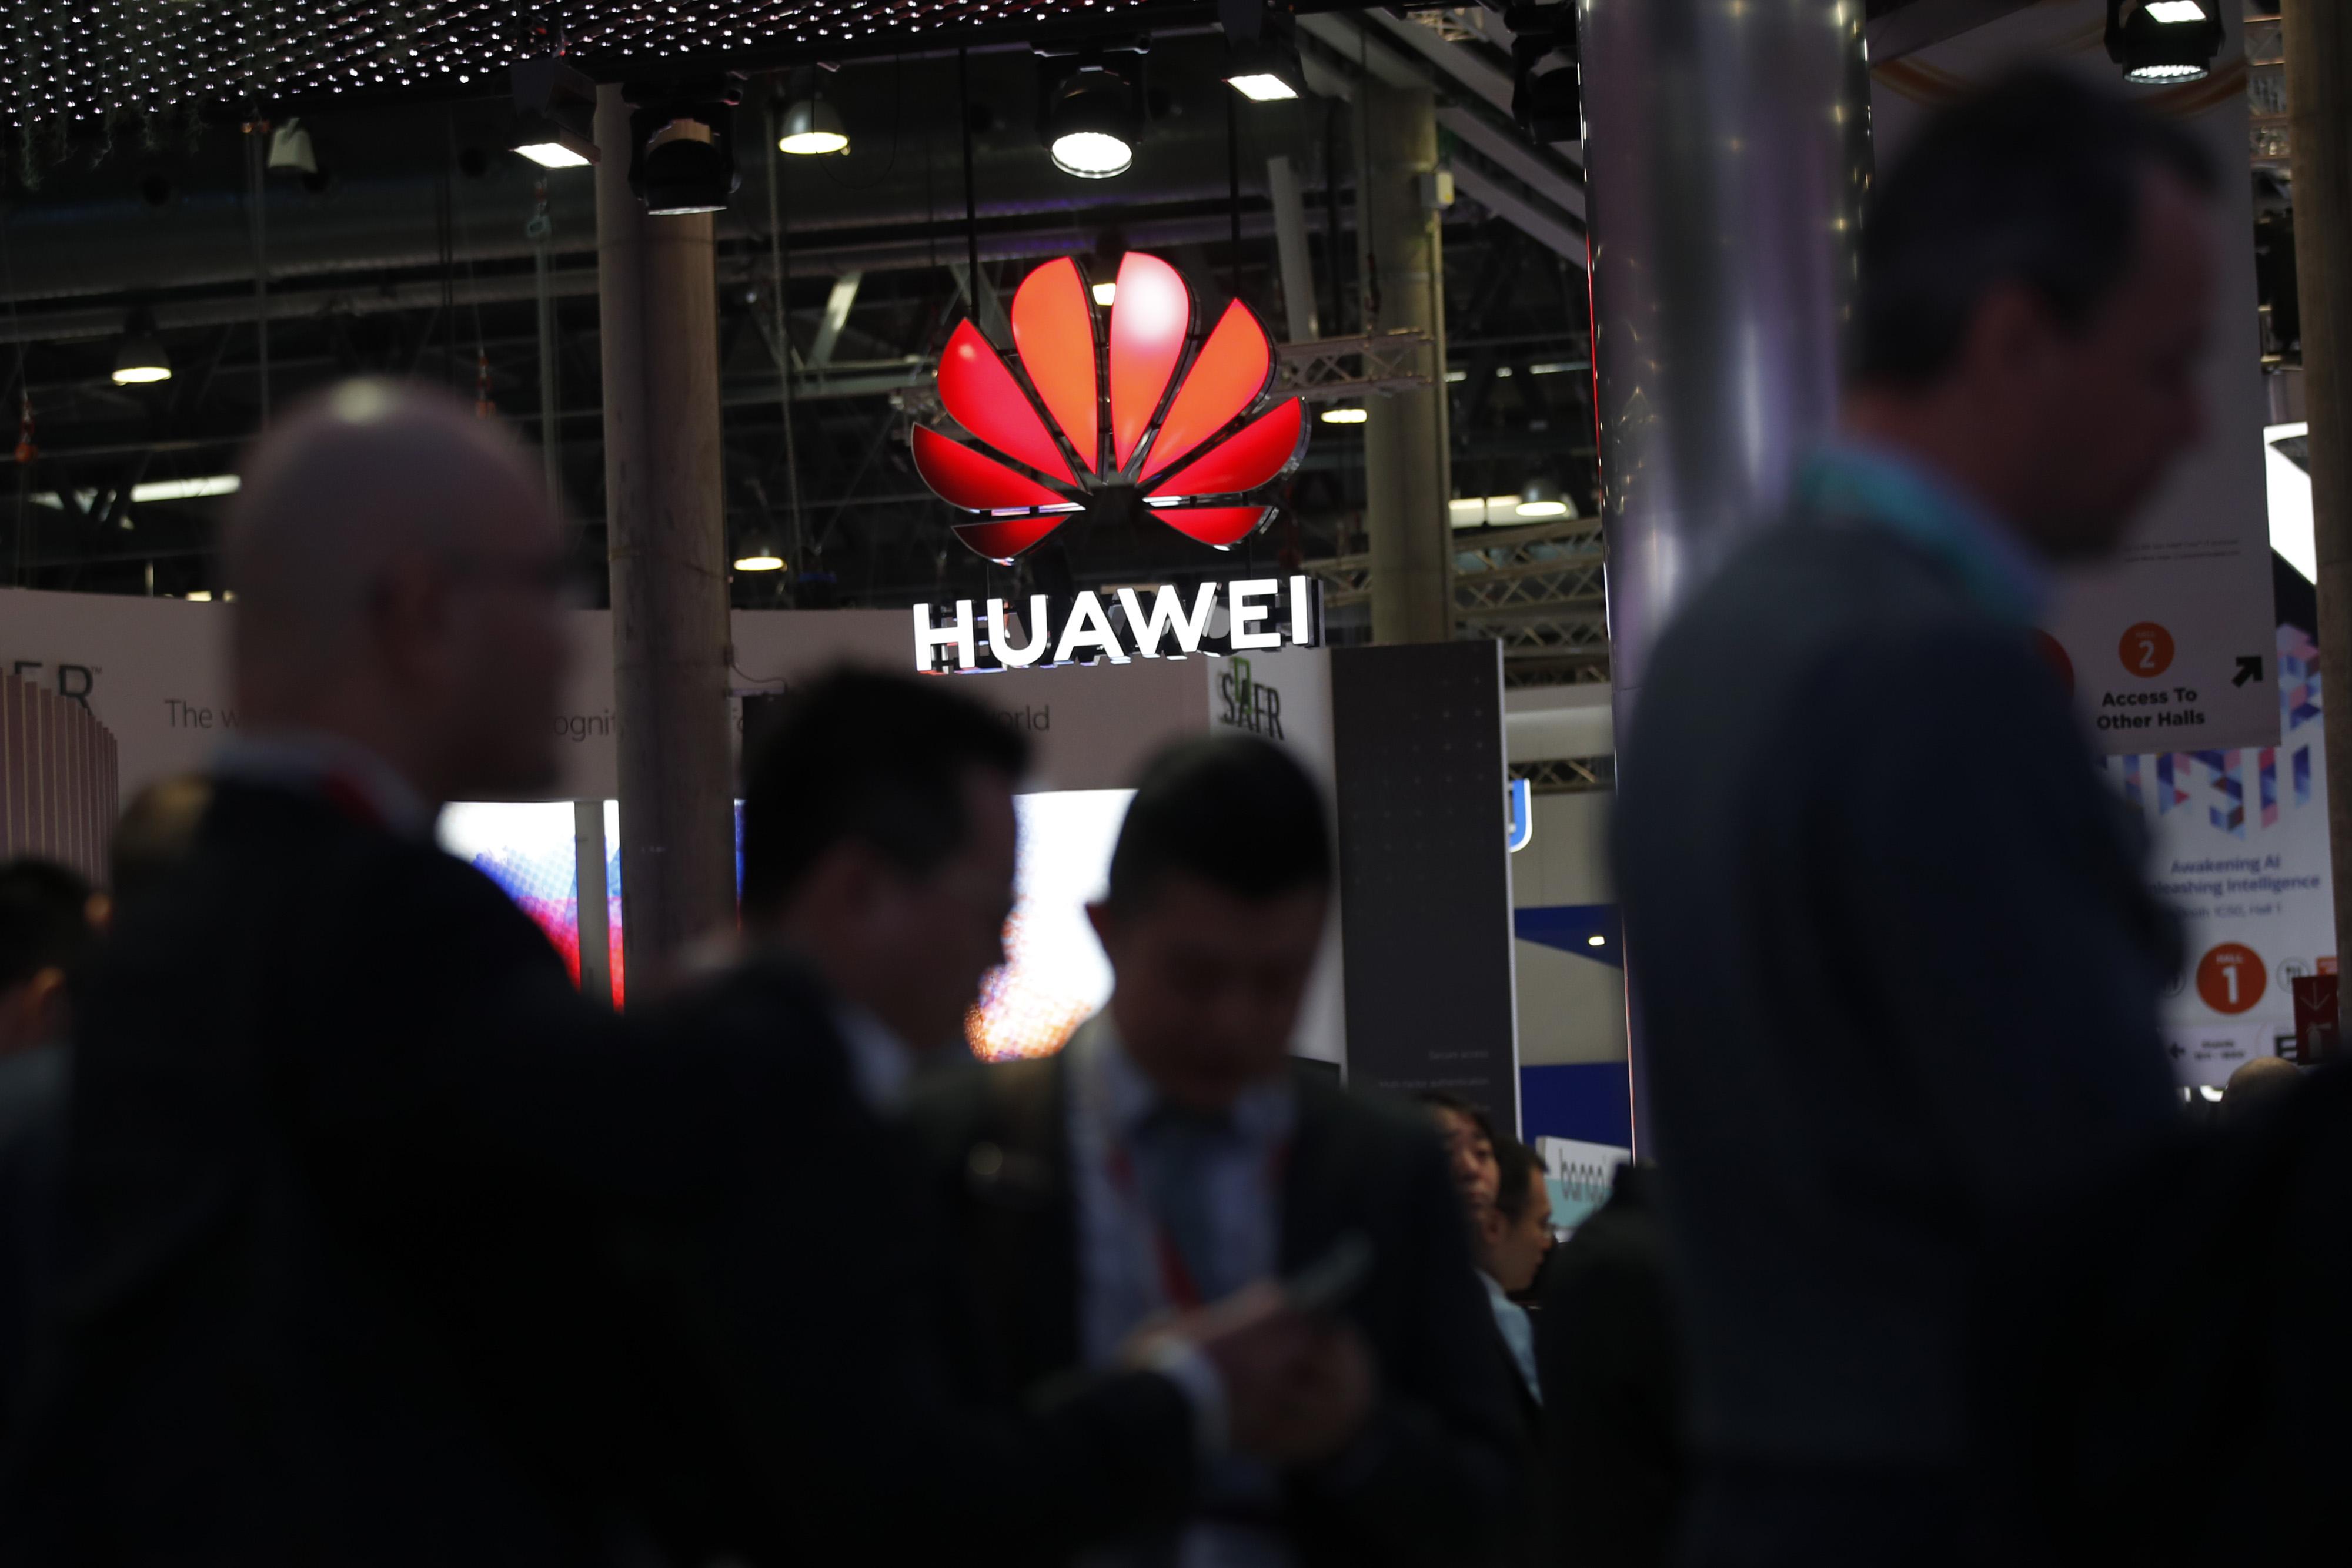 bloomberg.com - Oliver Sachgau - Huawei Isn't a Trustworthy 5G Partner, German Intelligence Says